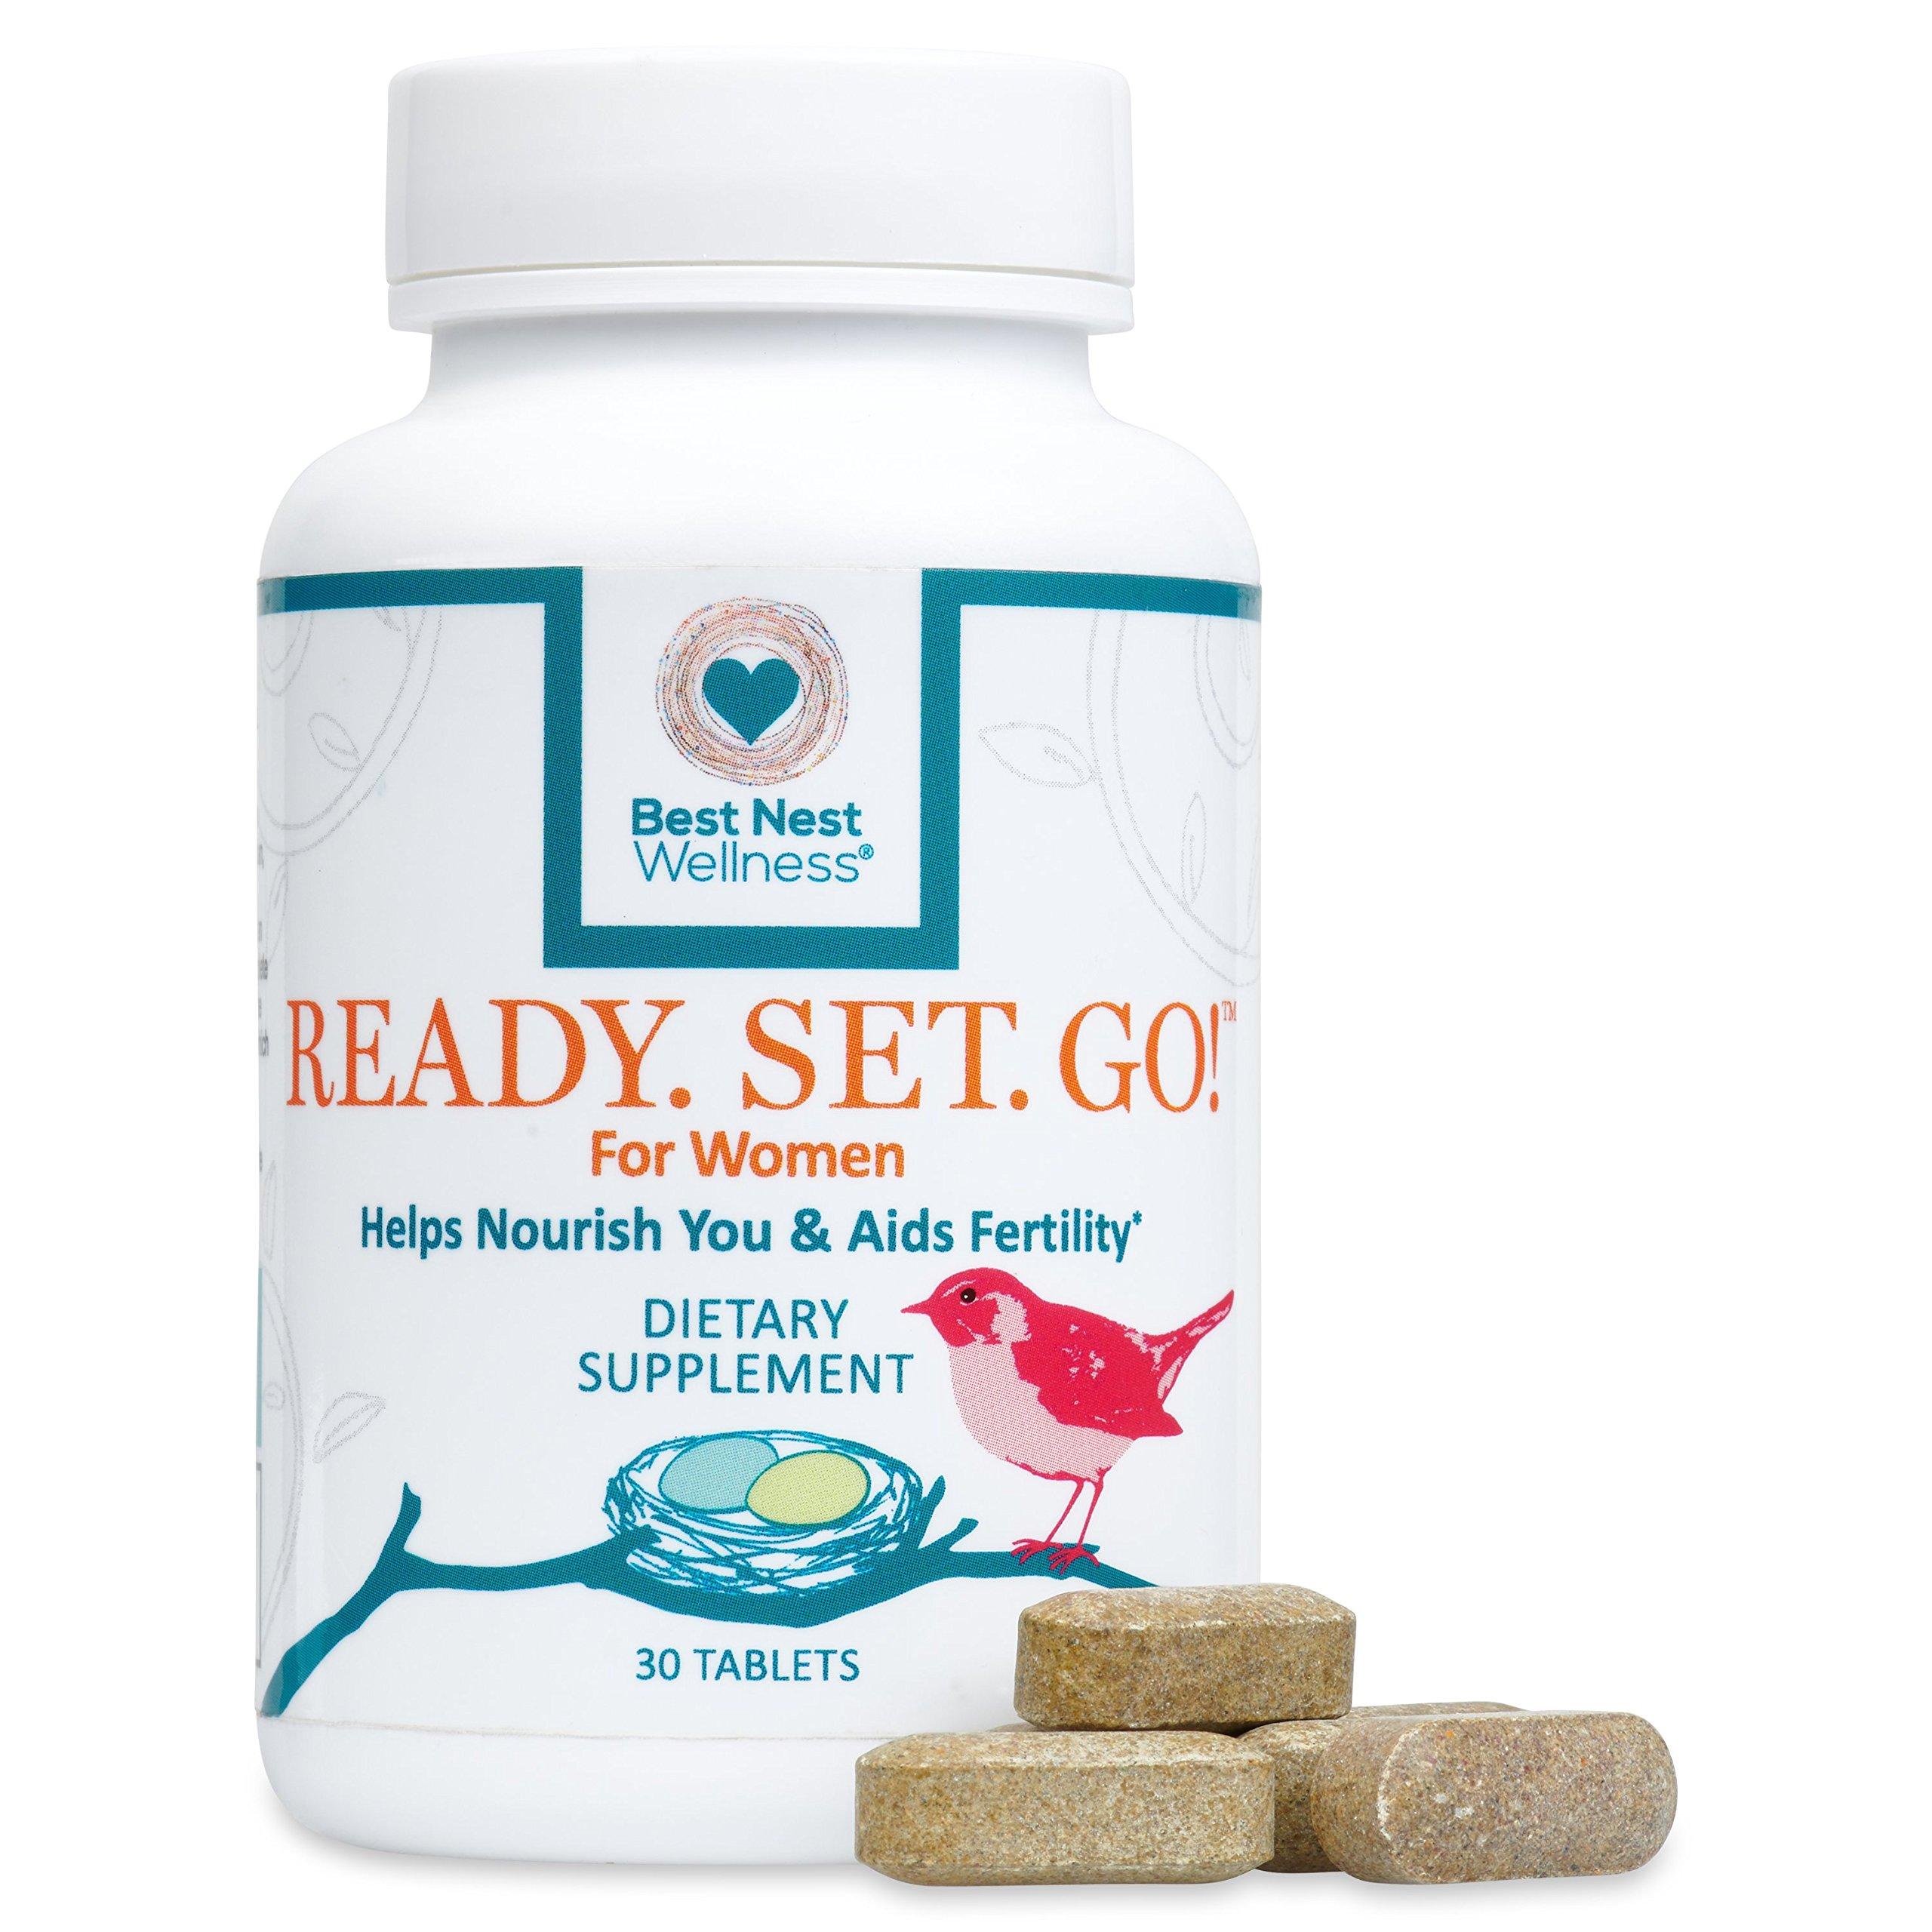 Ready. Set. Go! Best Nest Fertility Formula for Women, Doctor Recommended, Methylfolate, Whole Food, Antioxidants, Herbal Fertility Blend & Prenatal Nutrition, 30 Count by Best Nest Wellness